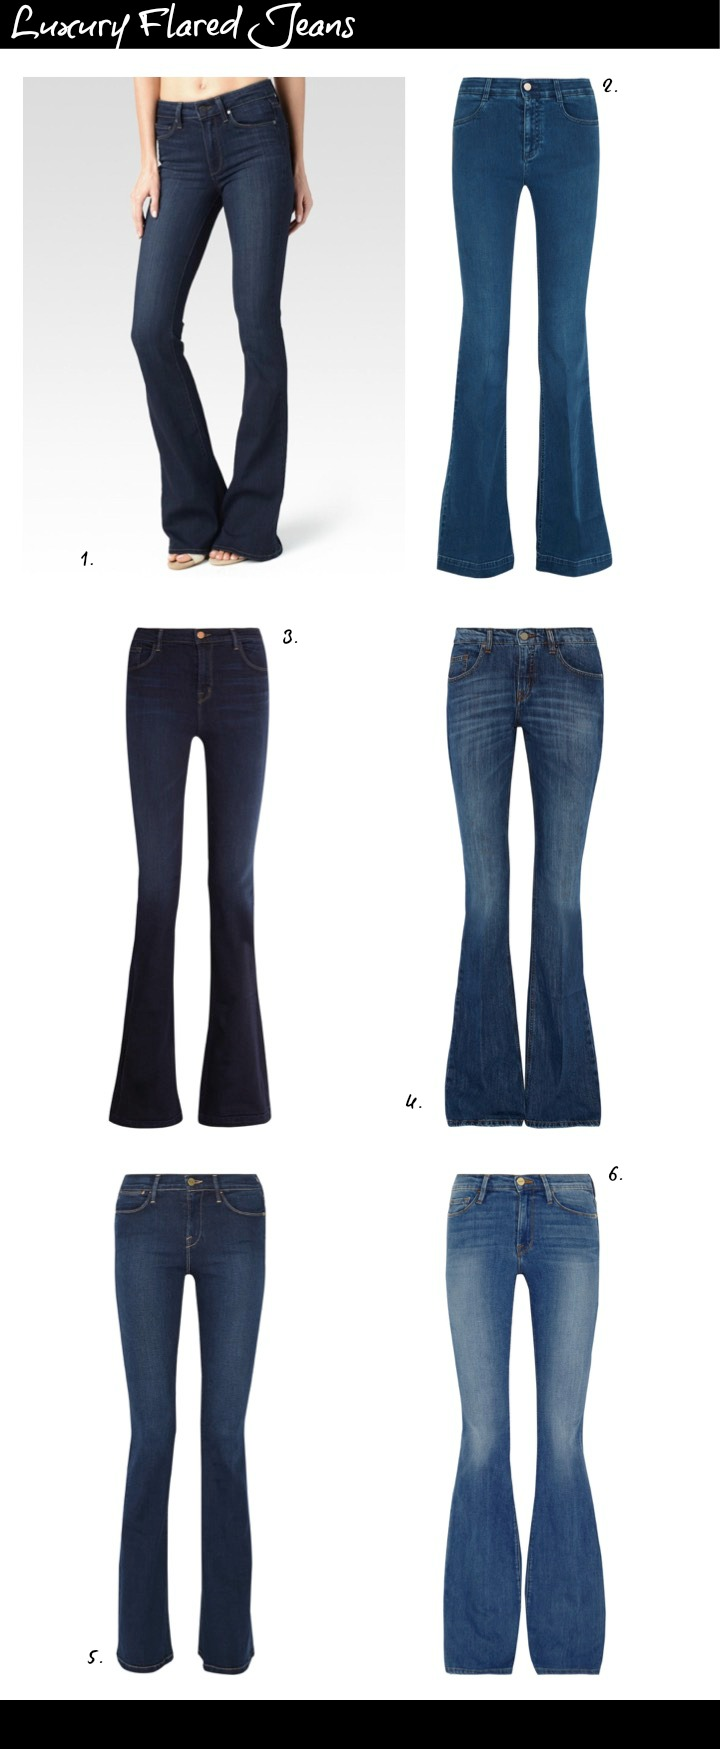 Best Flared Jeans Luxury Brands